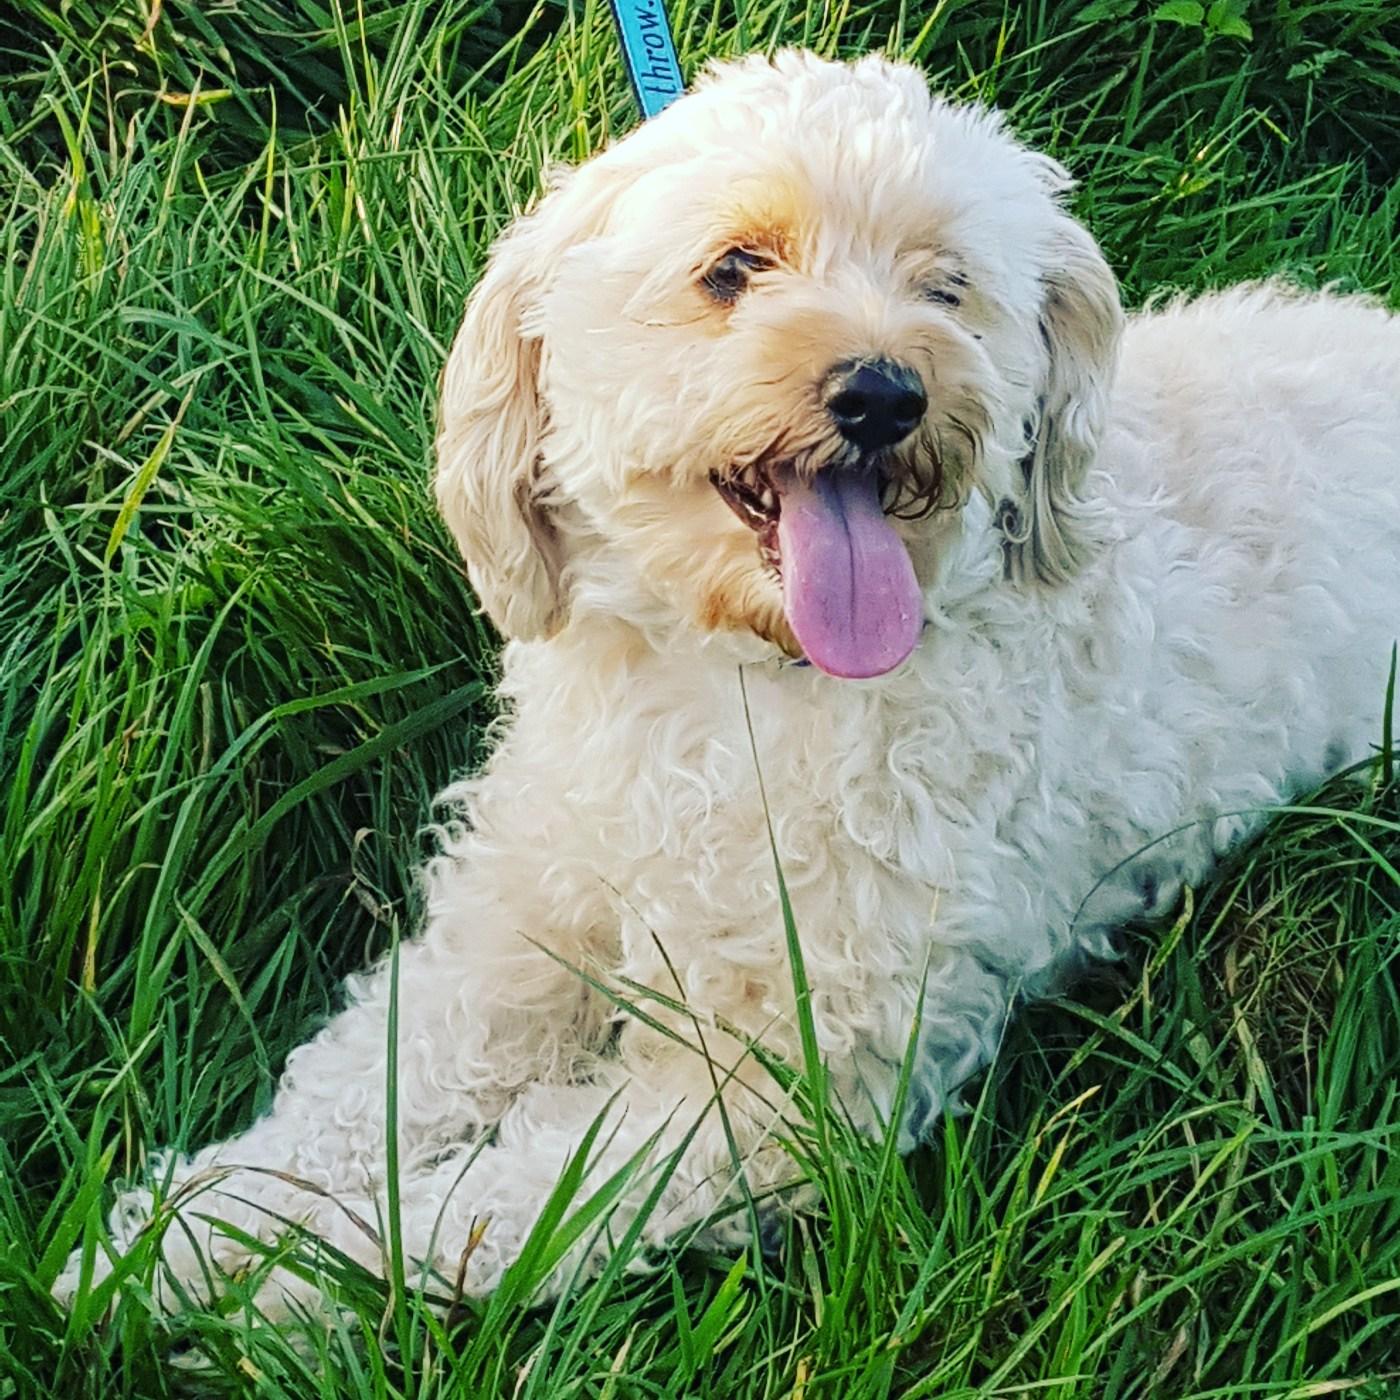 Rosie - Why do dog bury bones?